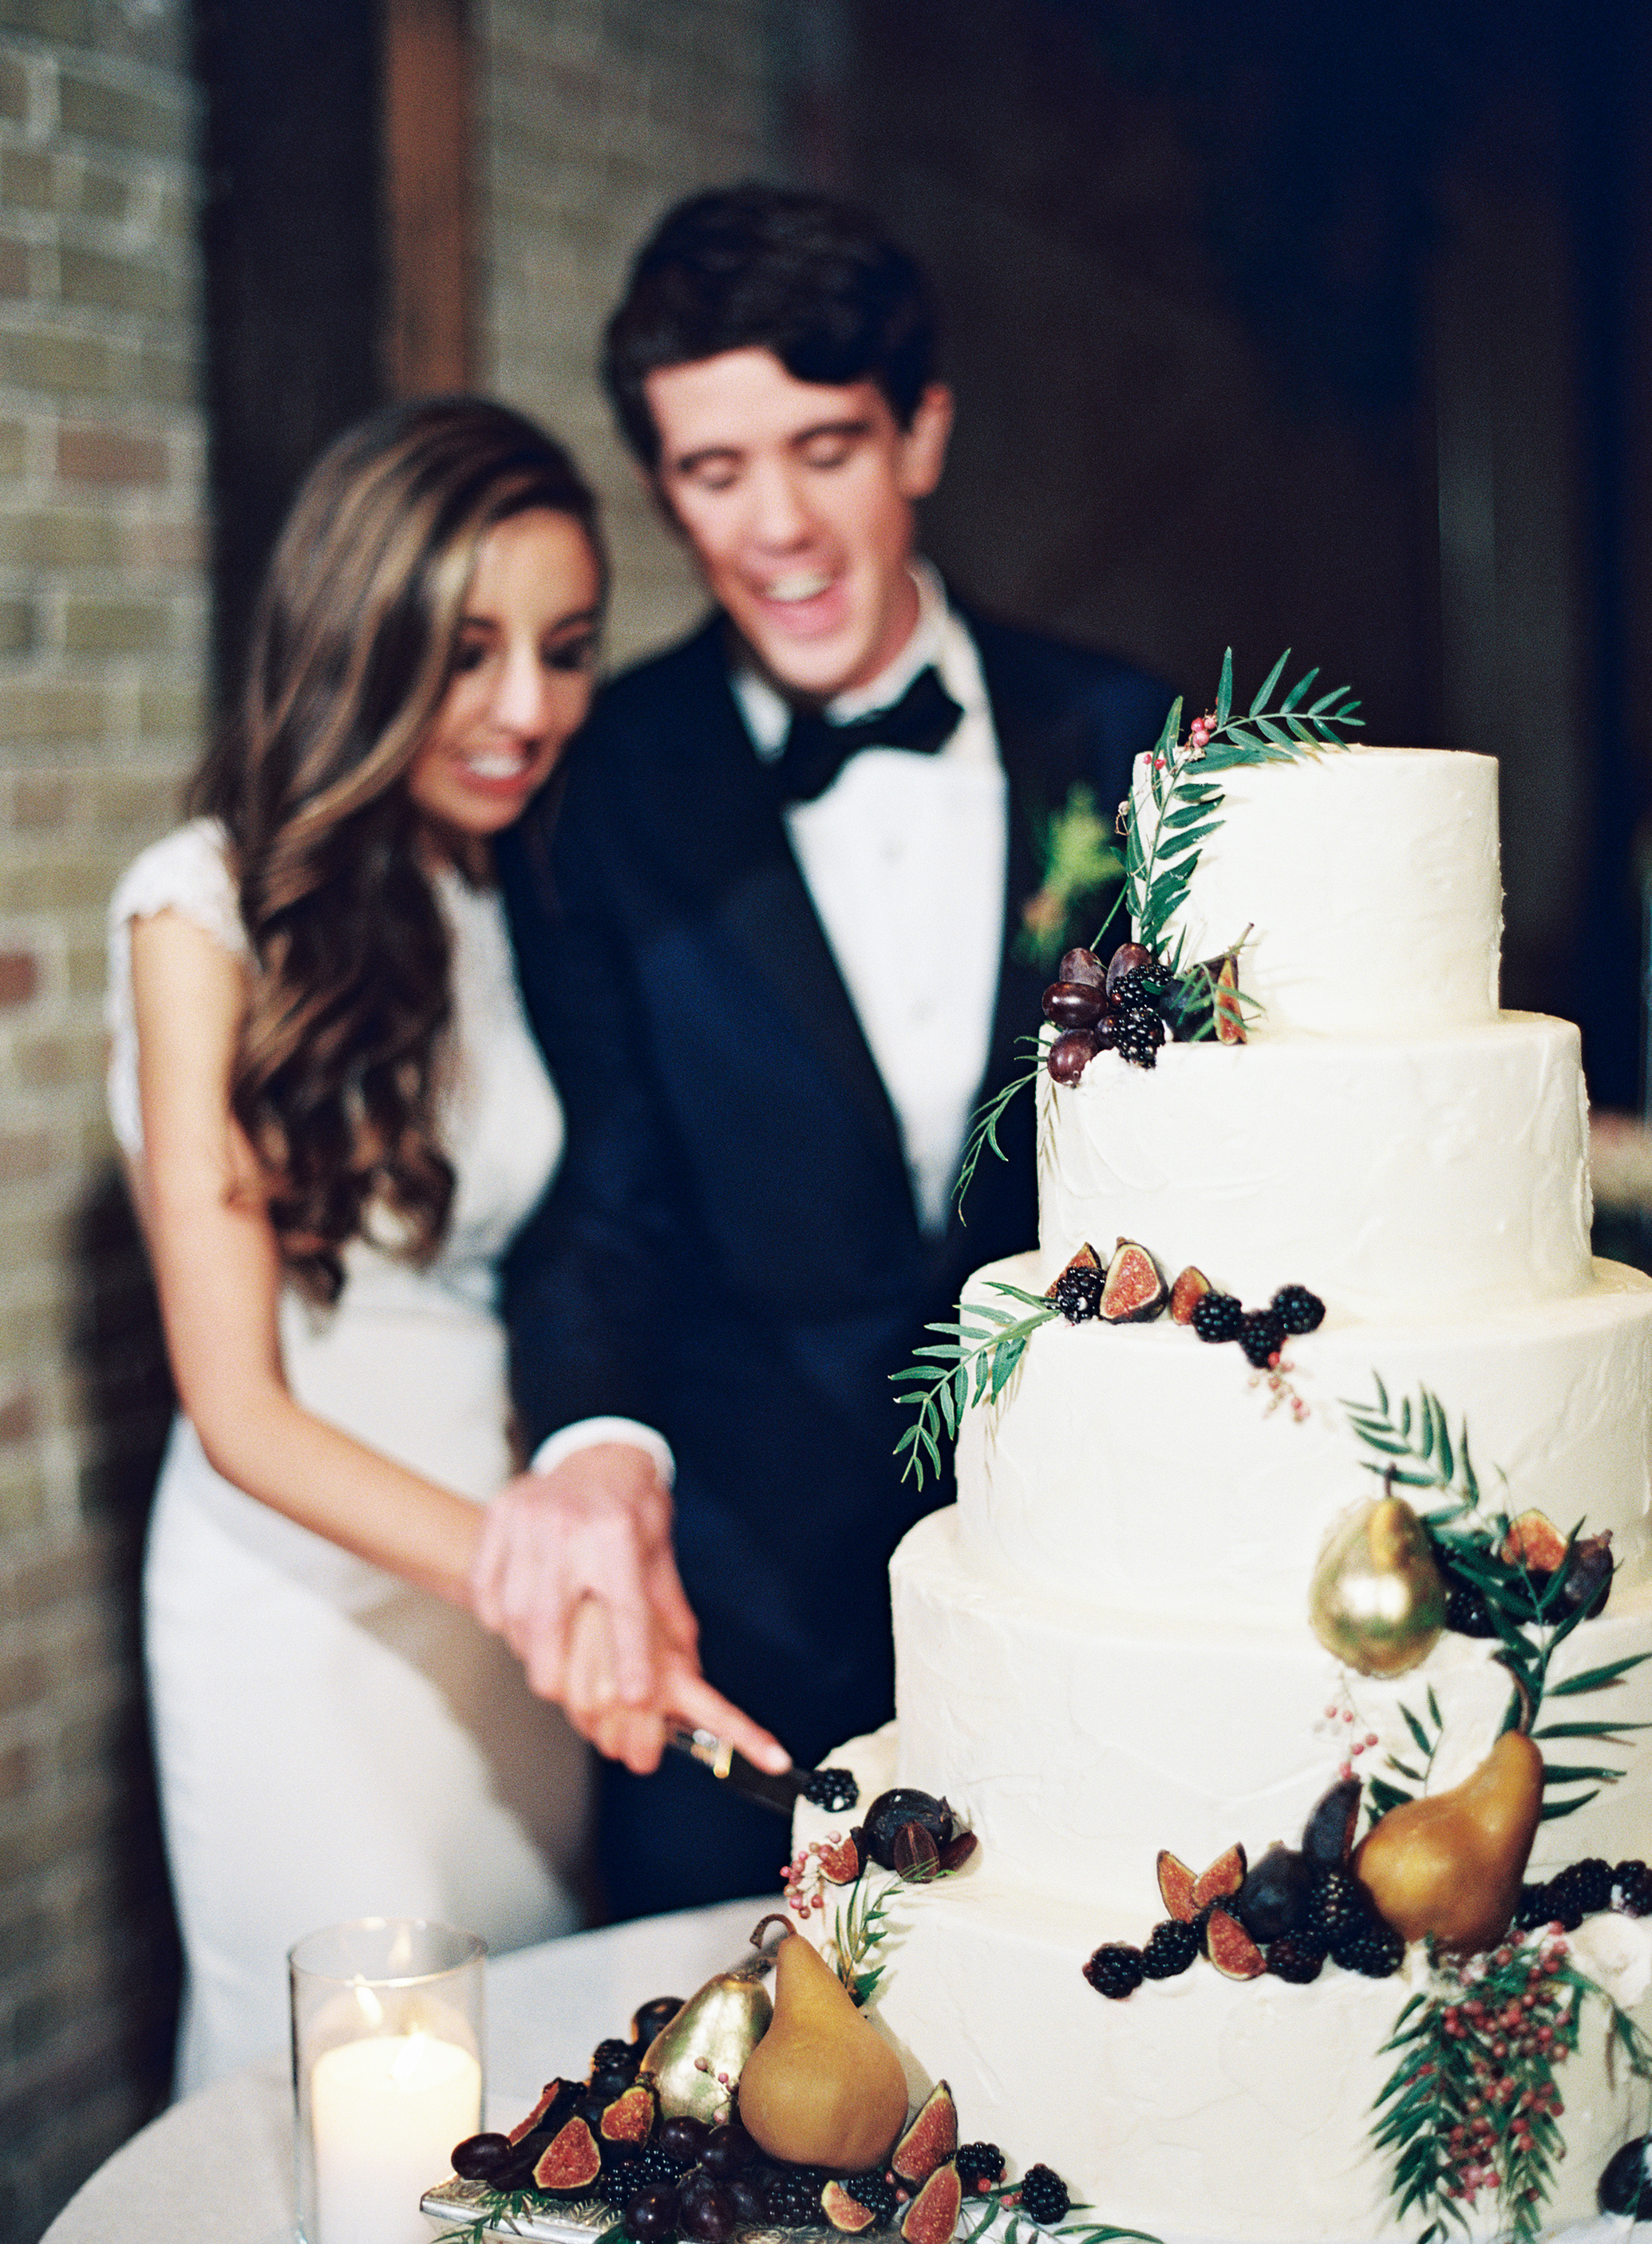 afton travers wedding cakecutting